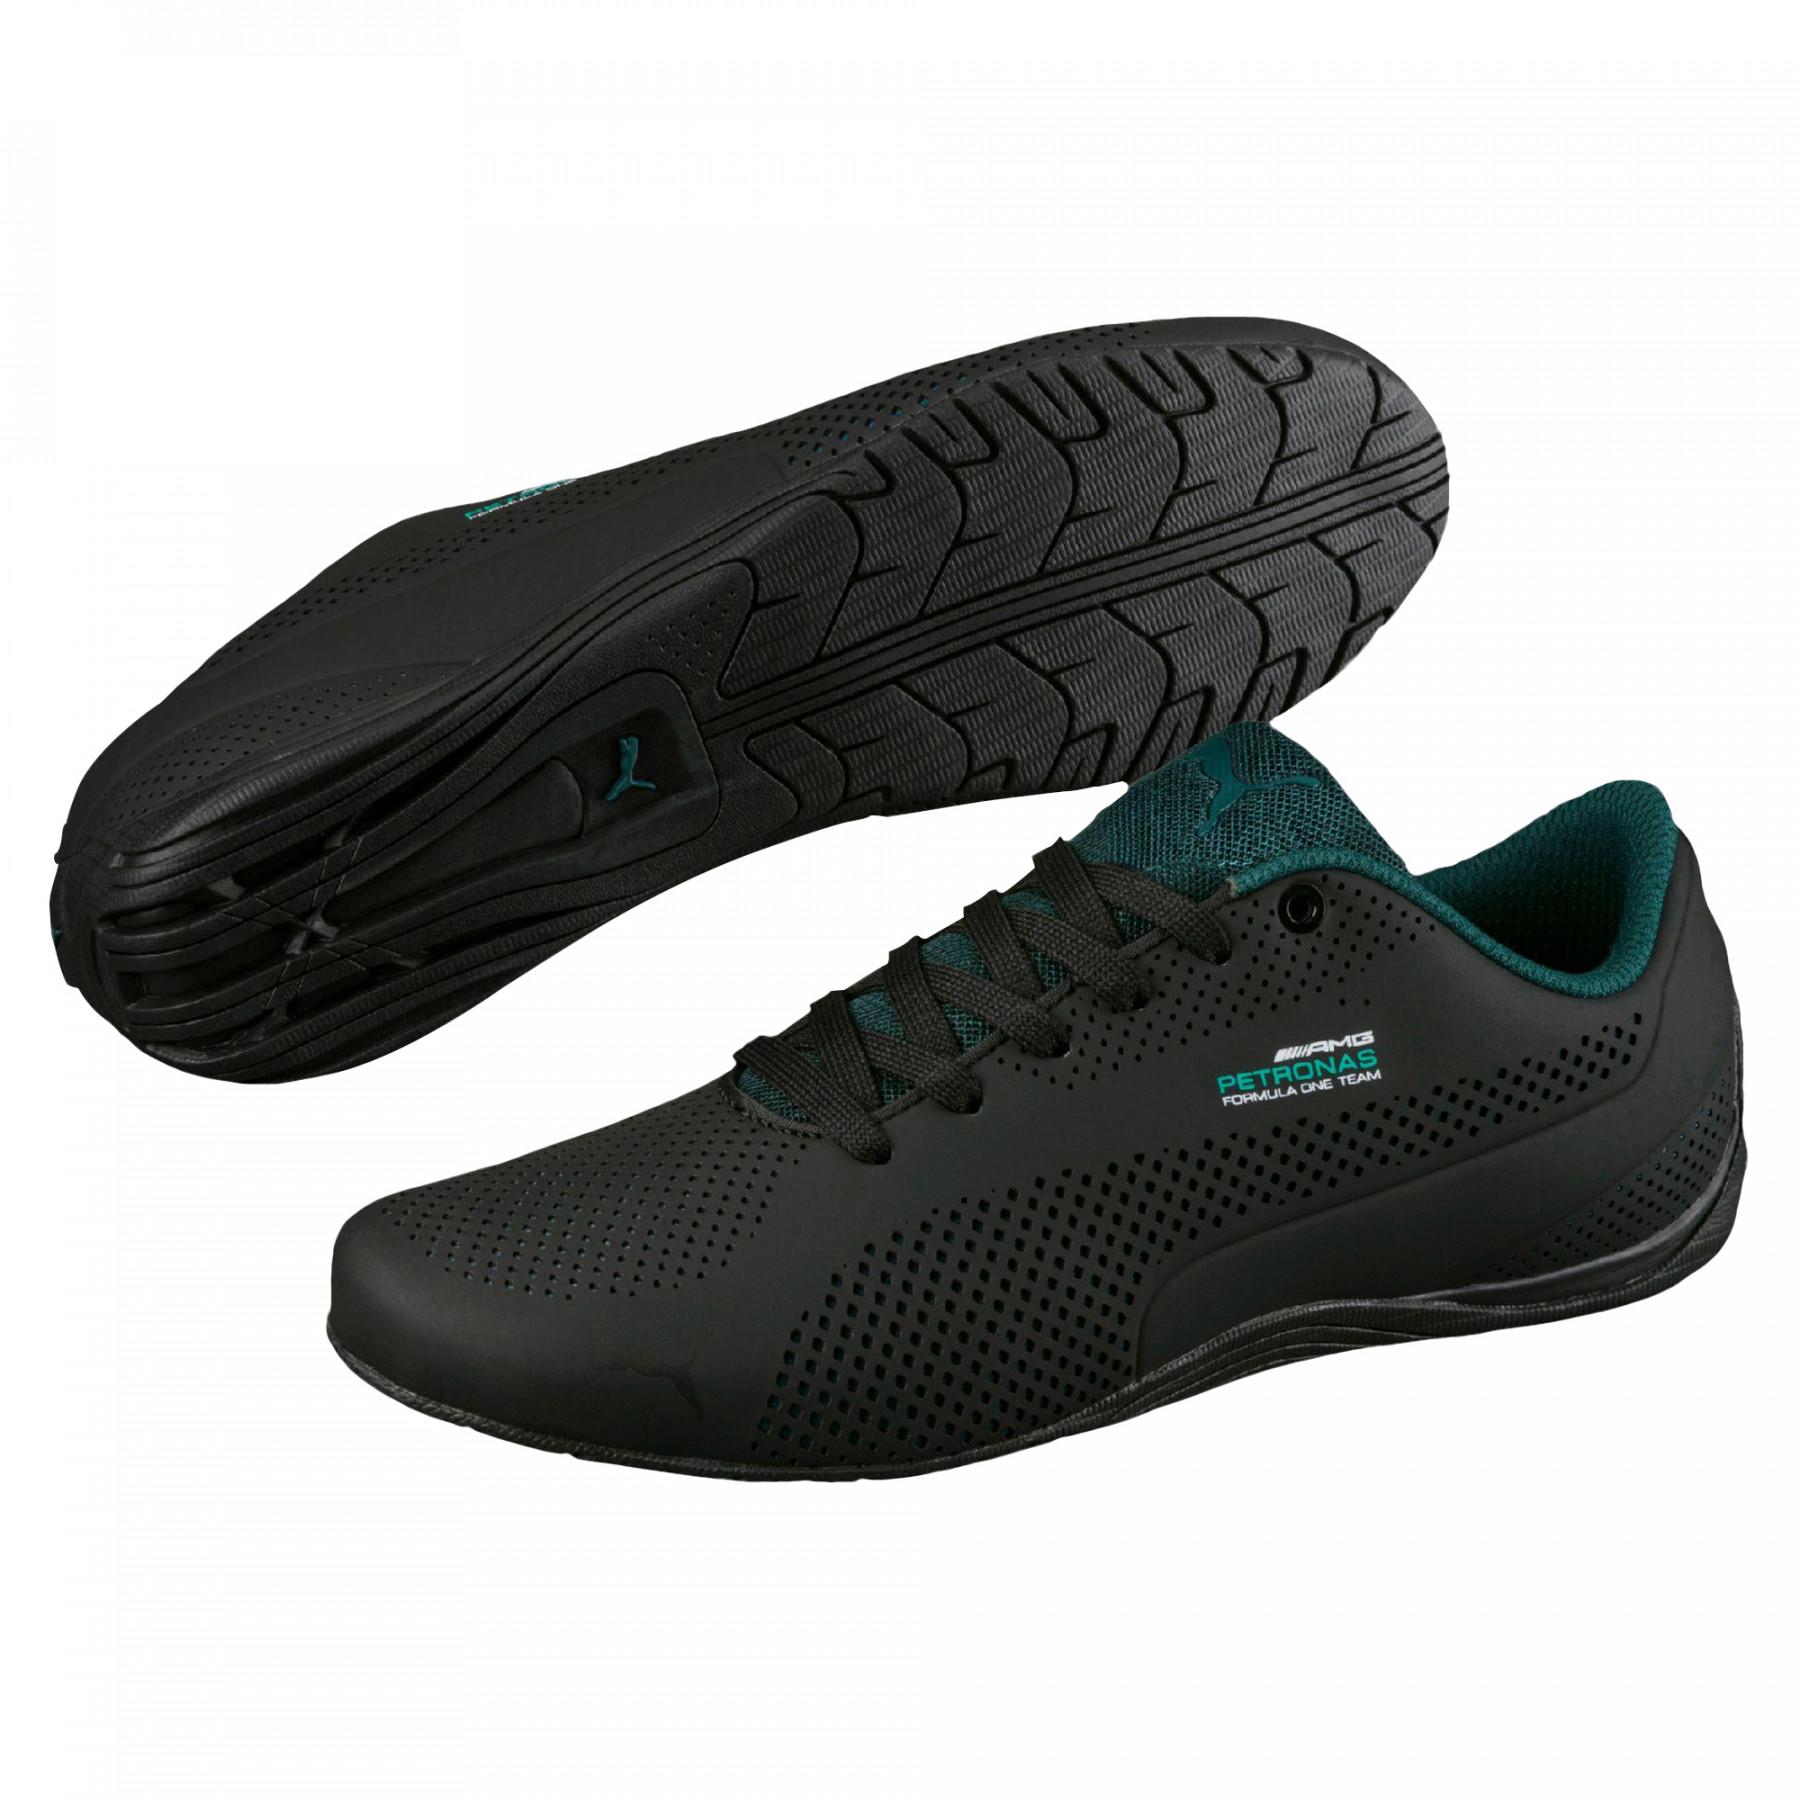 chaussures de sport puma mercedes homme